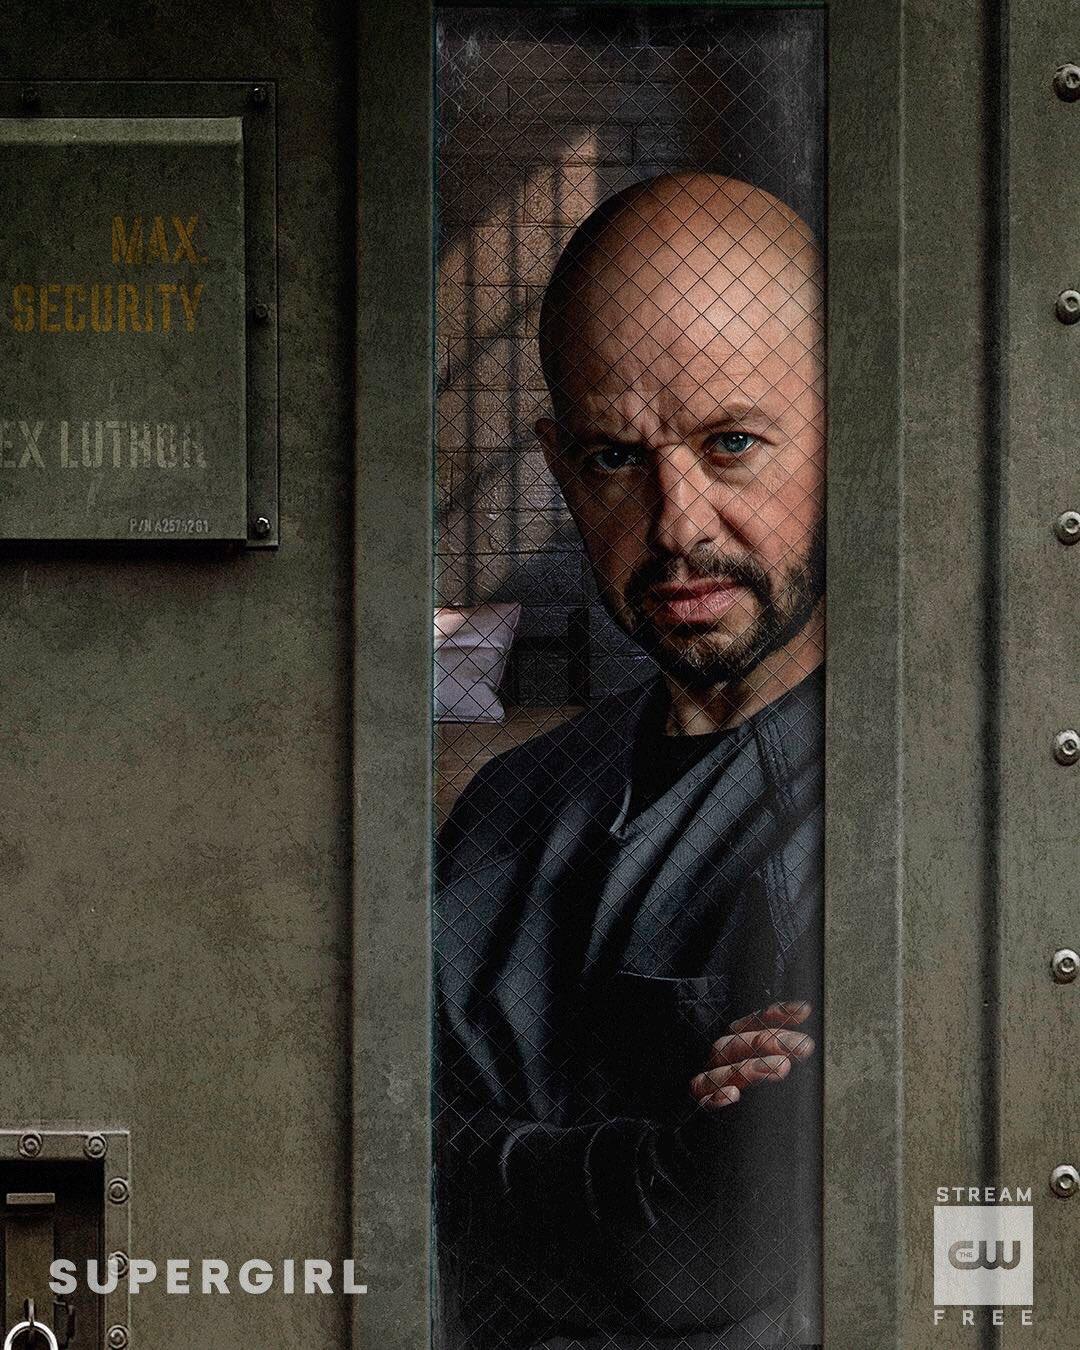 Jon Cryer es Lex Luthor en la temporada 4 de Supergirl. Imagen: Supergirl Twitter (@TheCWSupergirl).